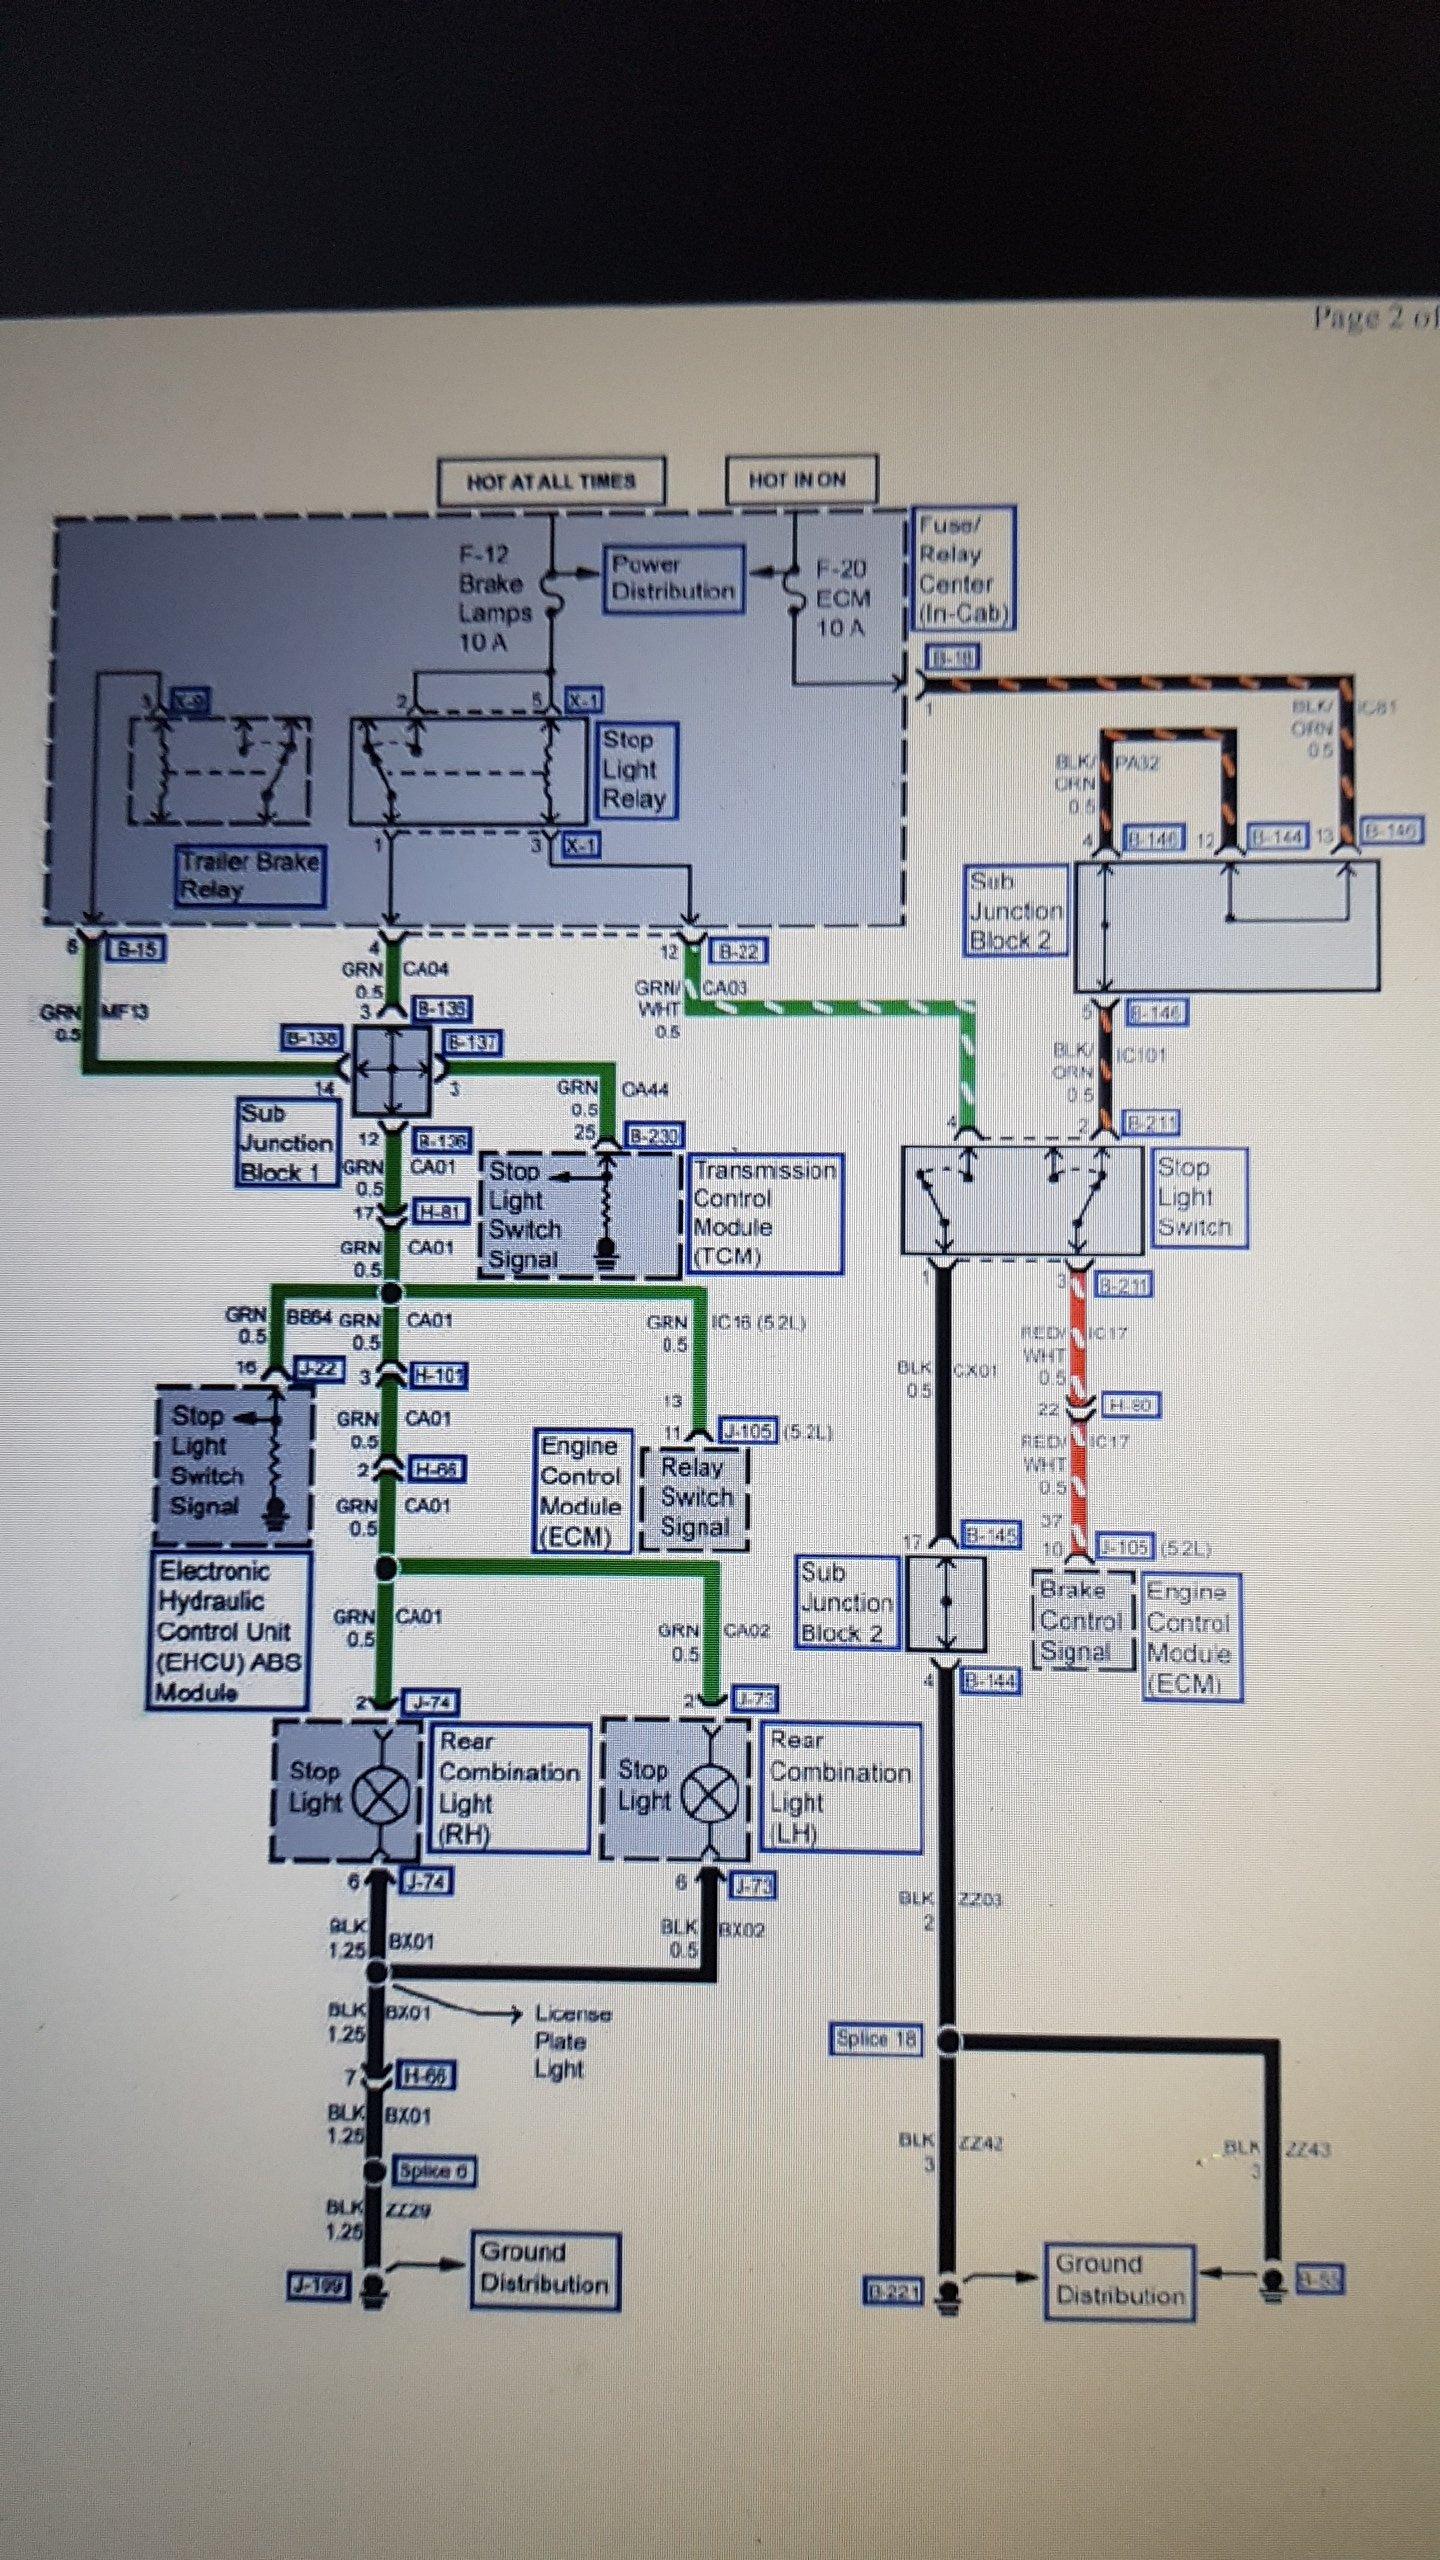 stop light wiring diagram isuzu - wiring diagram schema last-energy -  last-energy.atmosphereconcept.it  atmosphereconcept.it